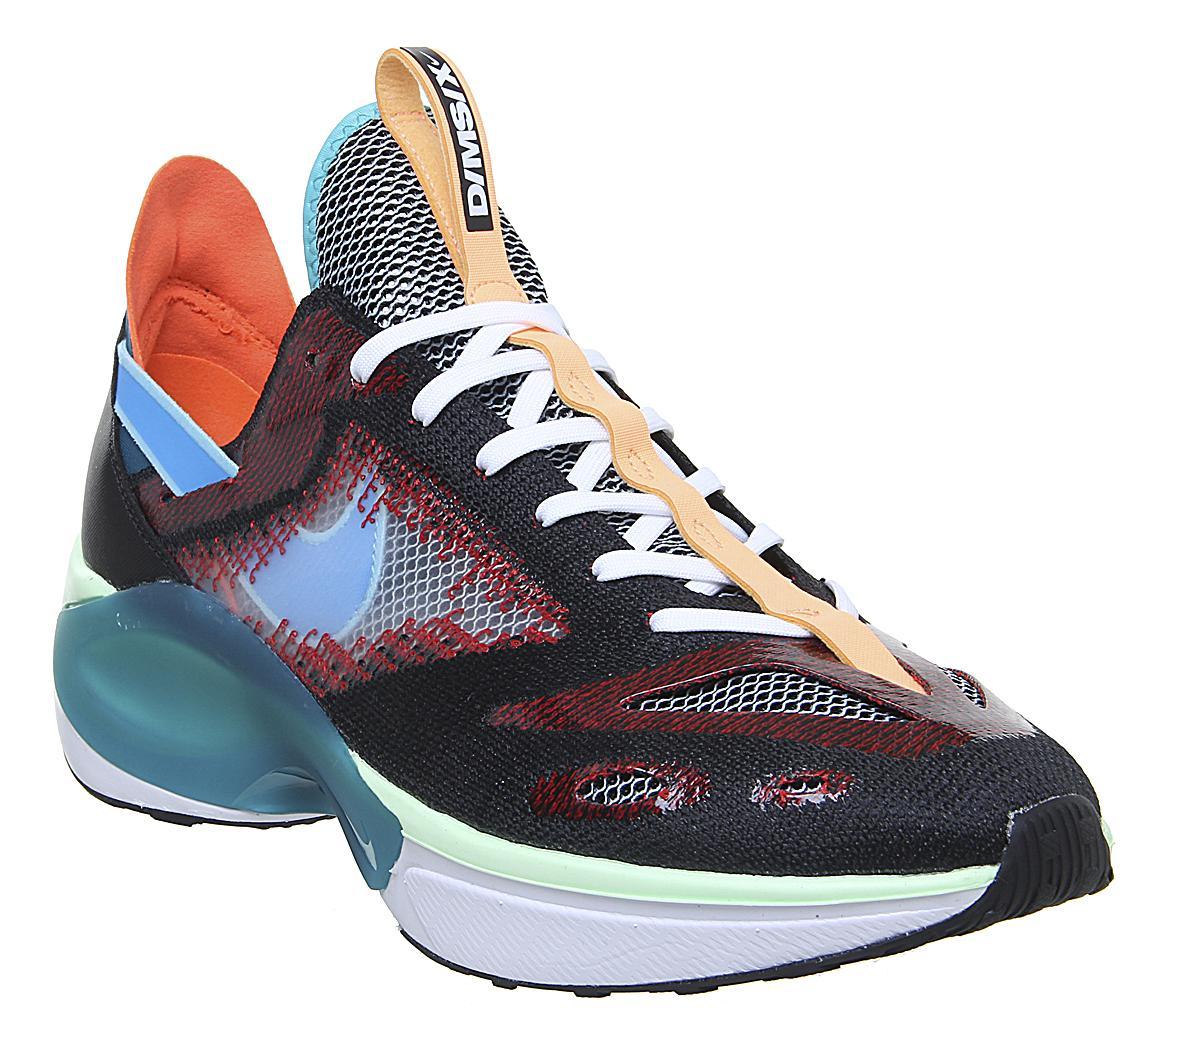 Walter Cunningham Insignia cinta  Nike Dimsix N110 Flyknit Trainers Black Blue Hero Blue Gaze University Red  - Unisex Sports